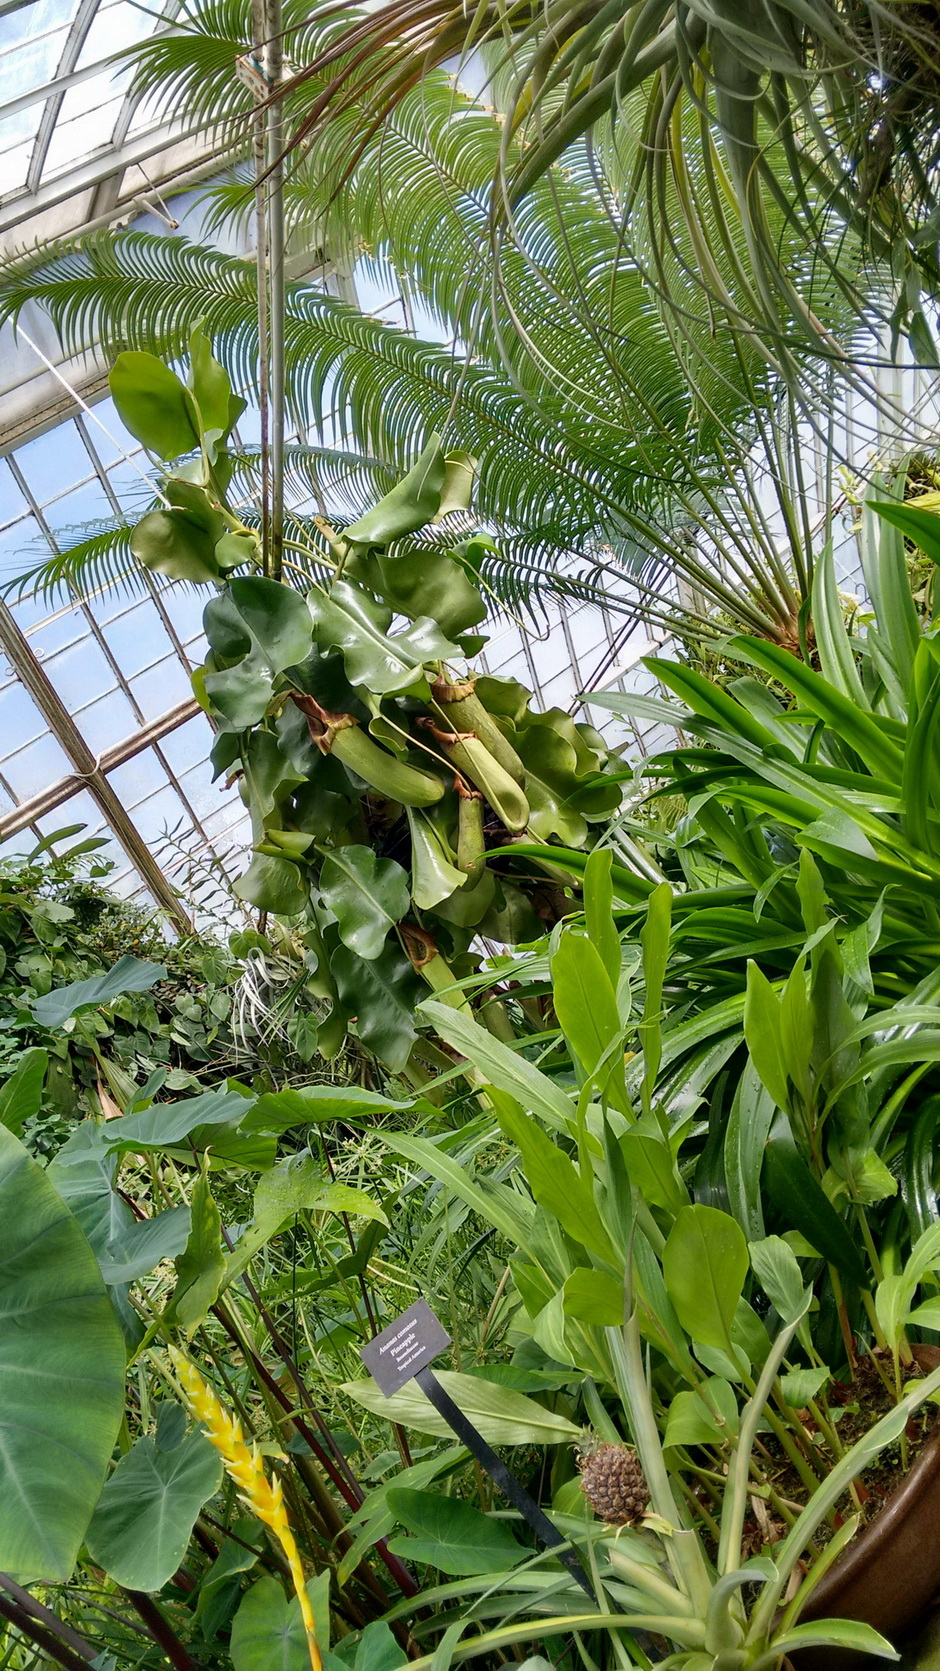 estufa espécies carnívoras, palmeiras e epífitas